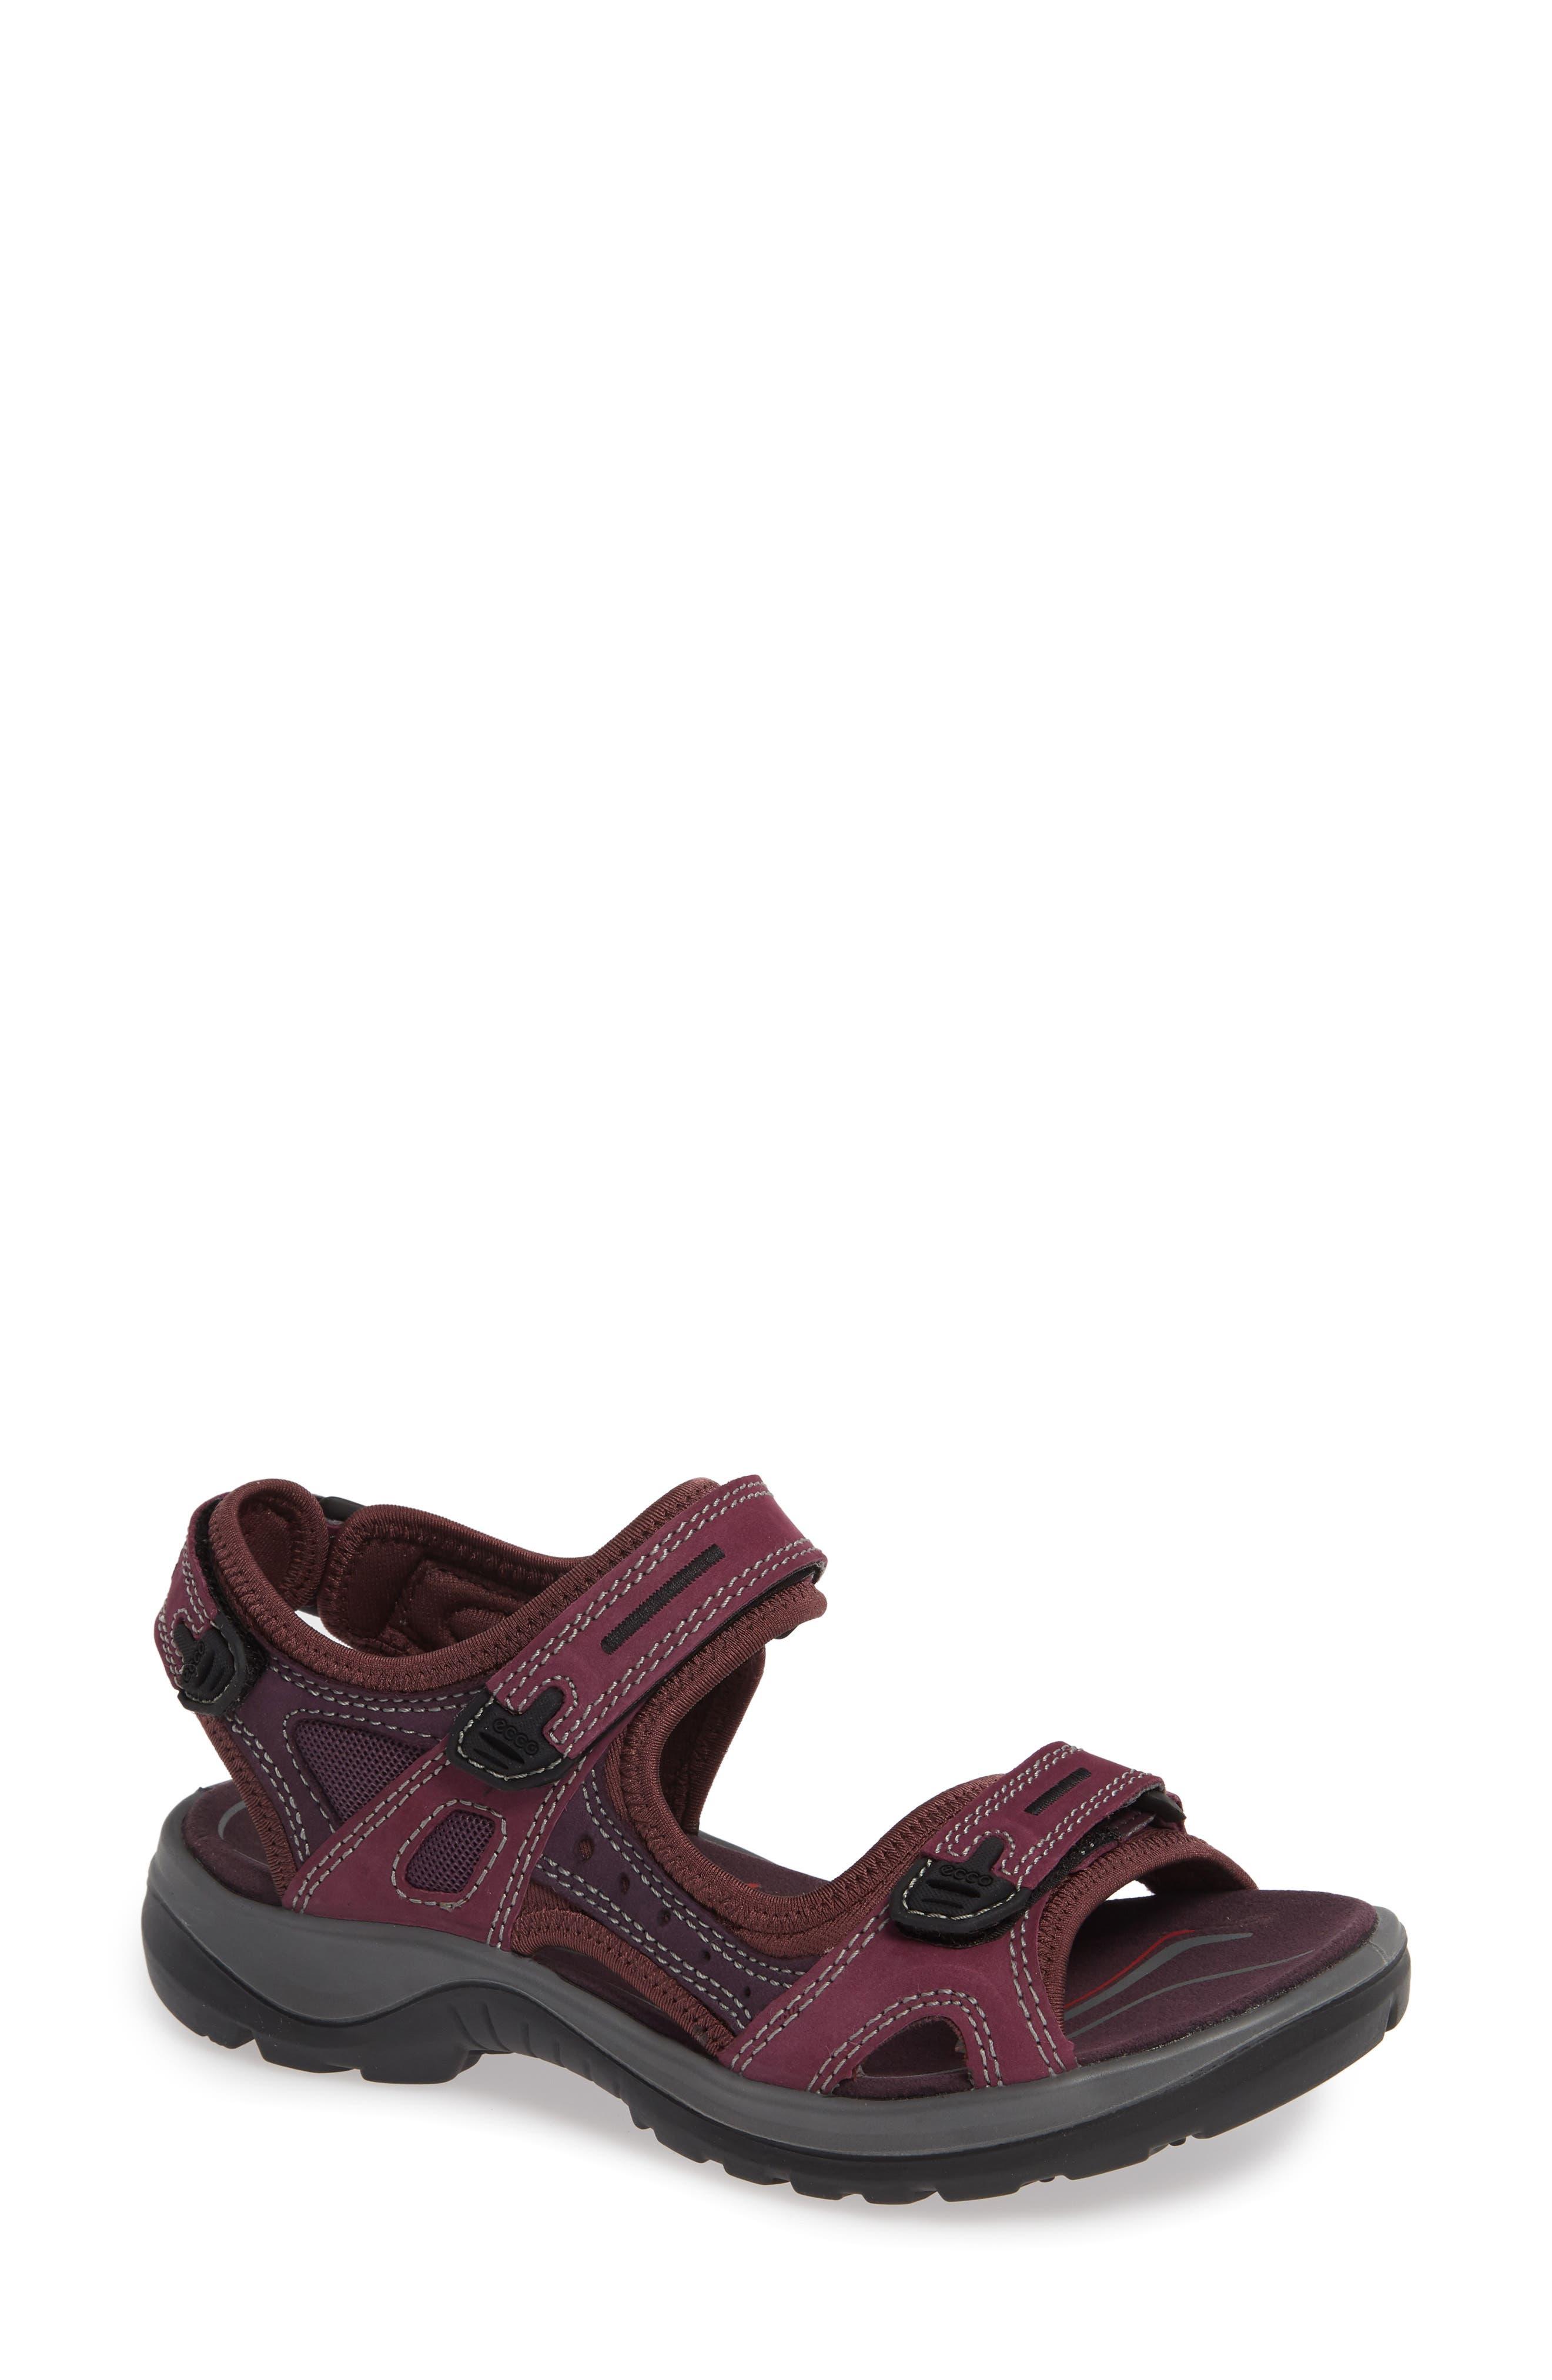 Ecco Yucatan Sandal, Purple